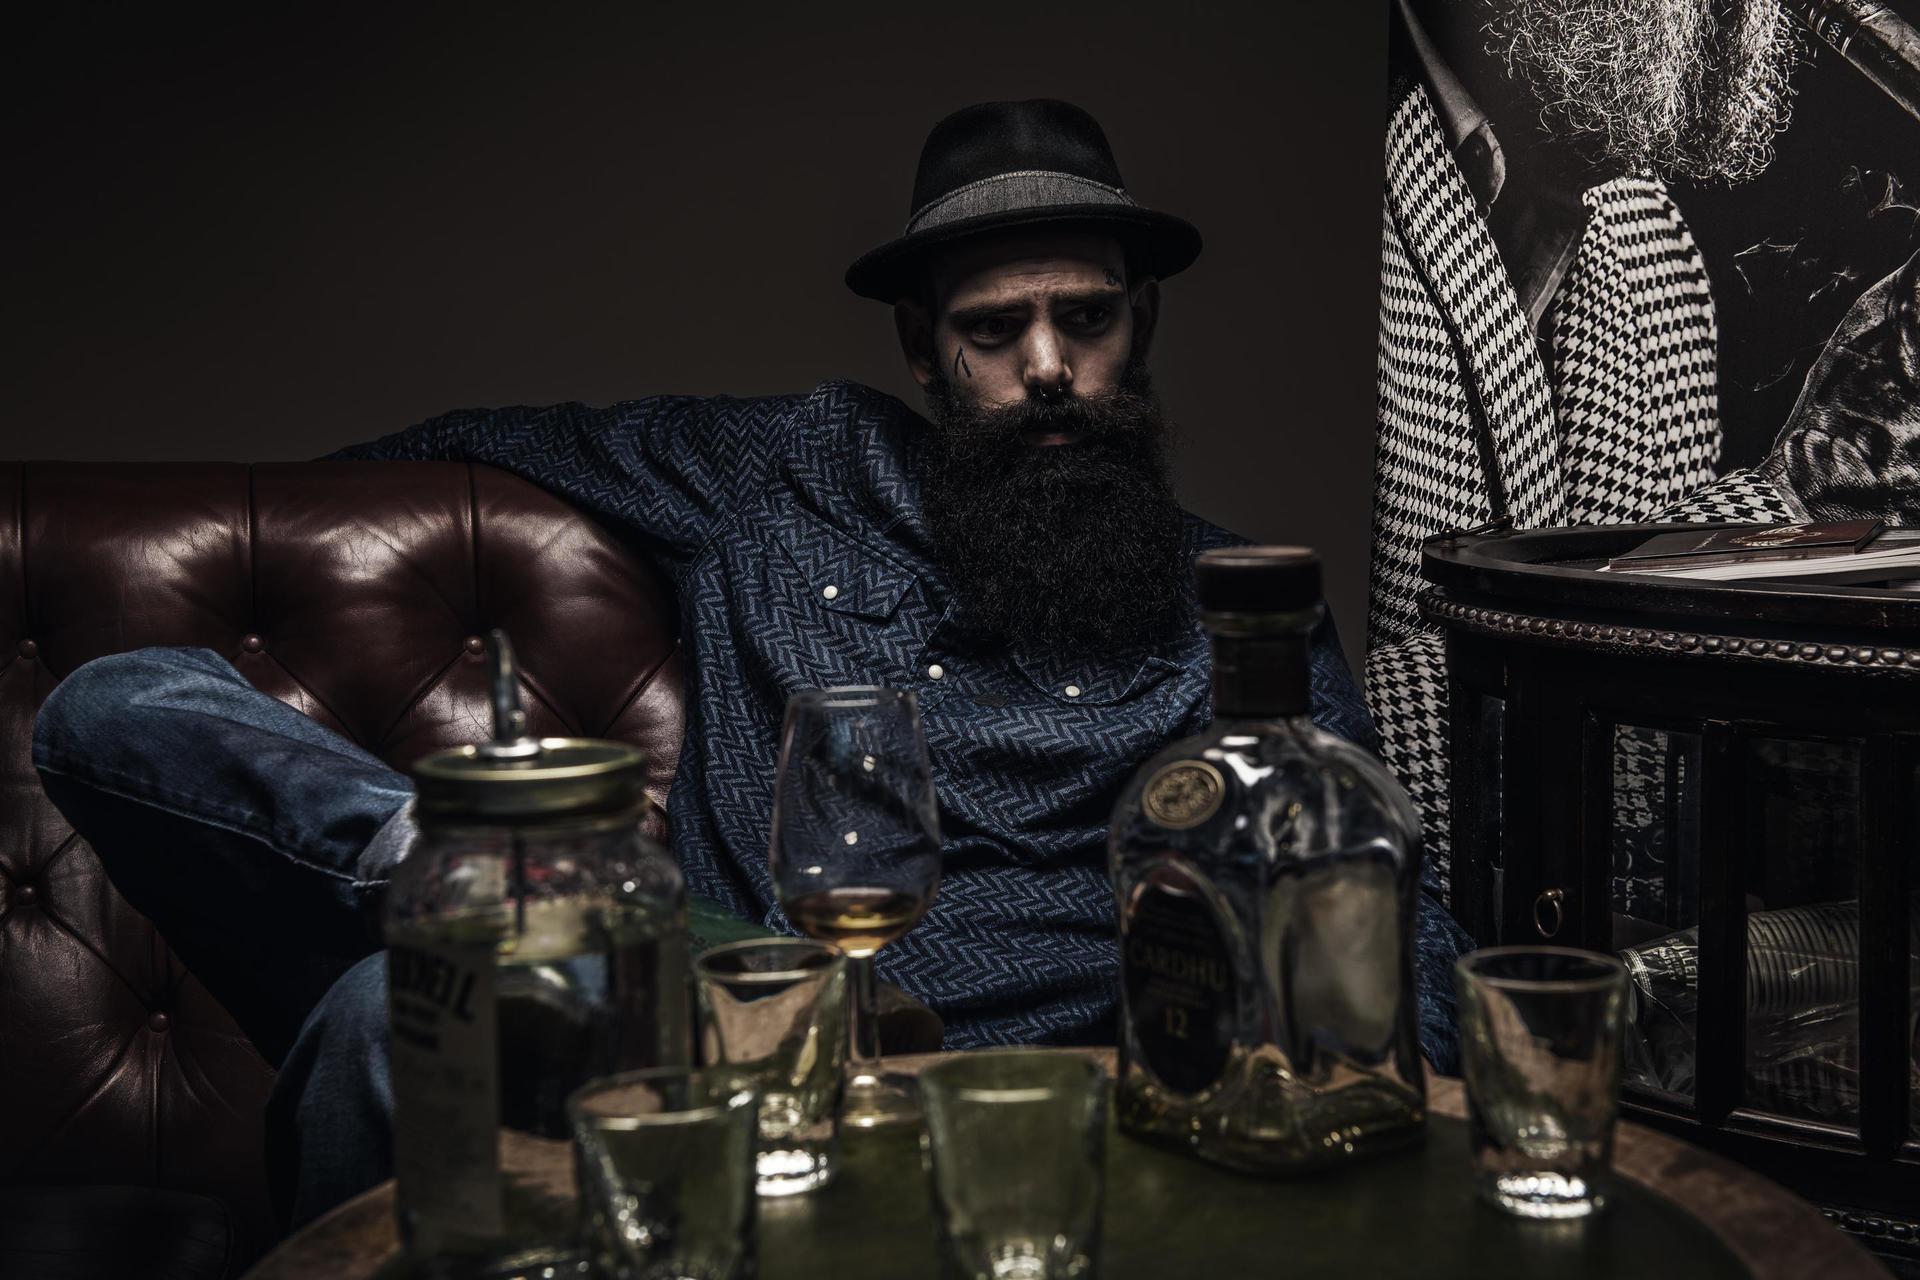 bertolini-photo-jacktheripper-barbershop-9